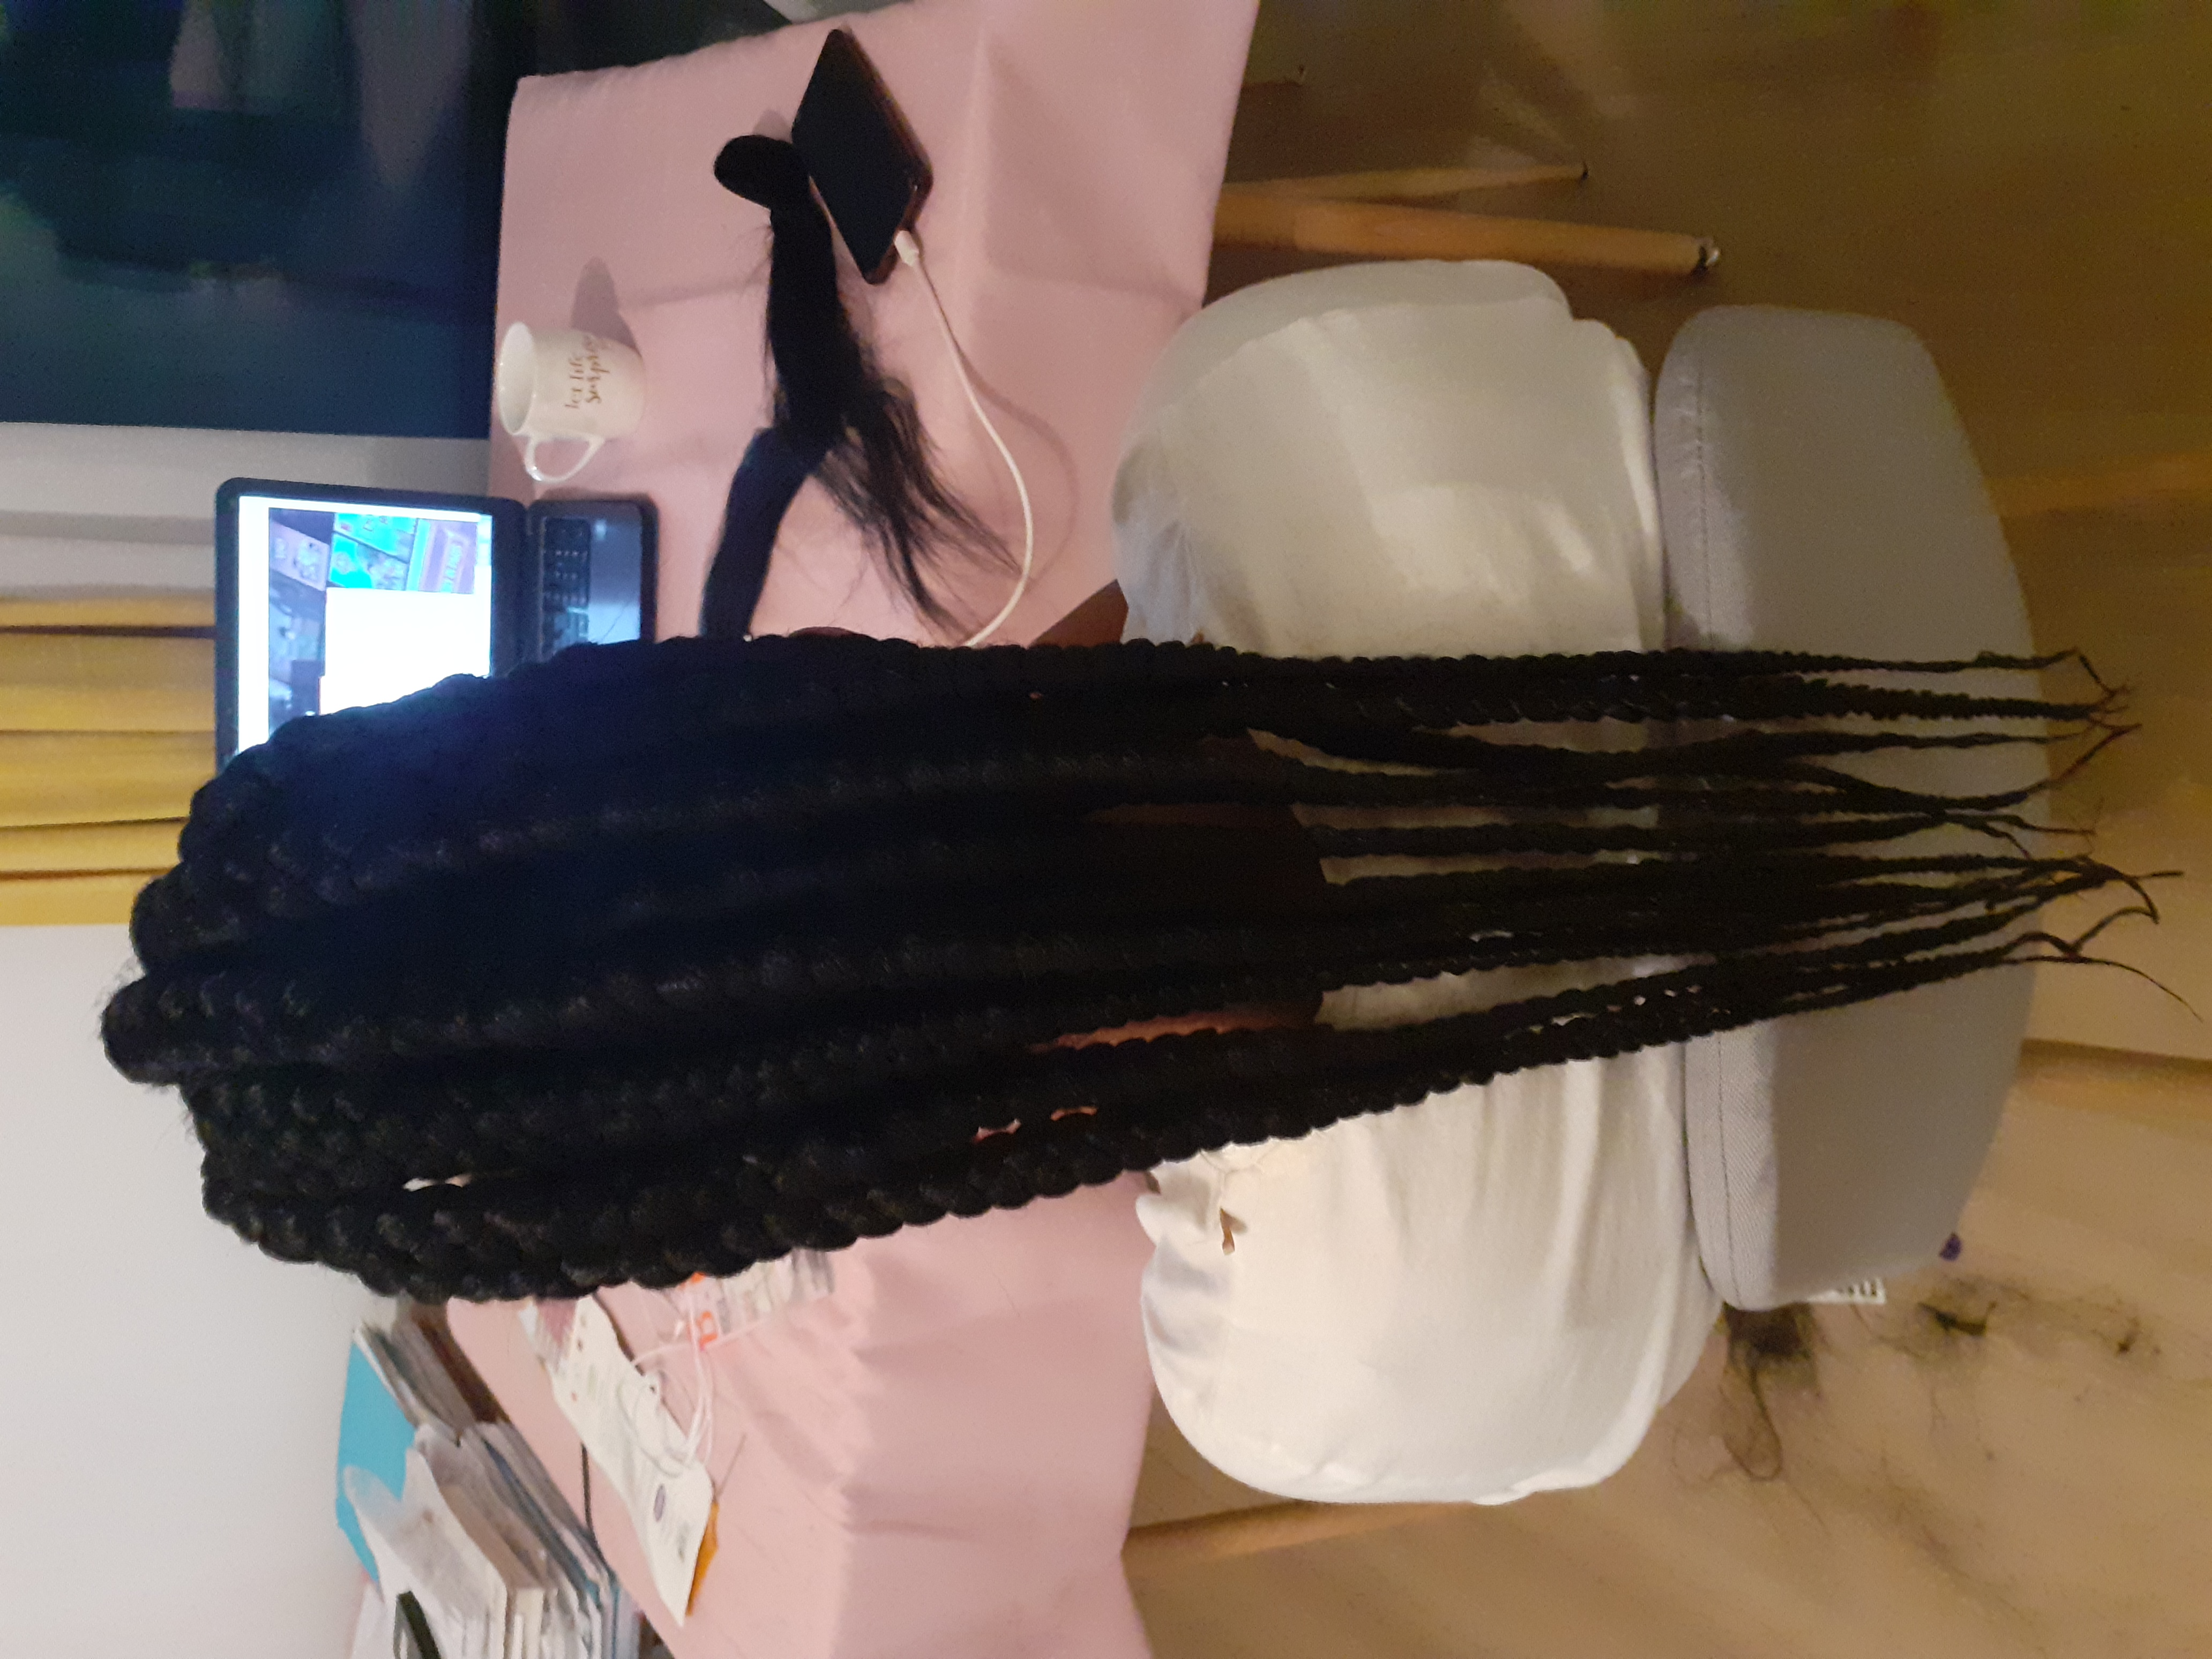 salon de coiffure afro tresse tresses box braids crochet braids vanilles tissages paris 75 77 78 91 92 93 94 95 IIBNFWTF